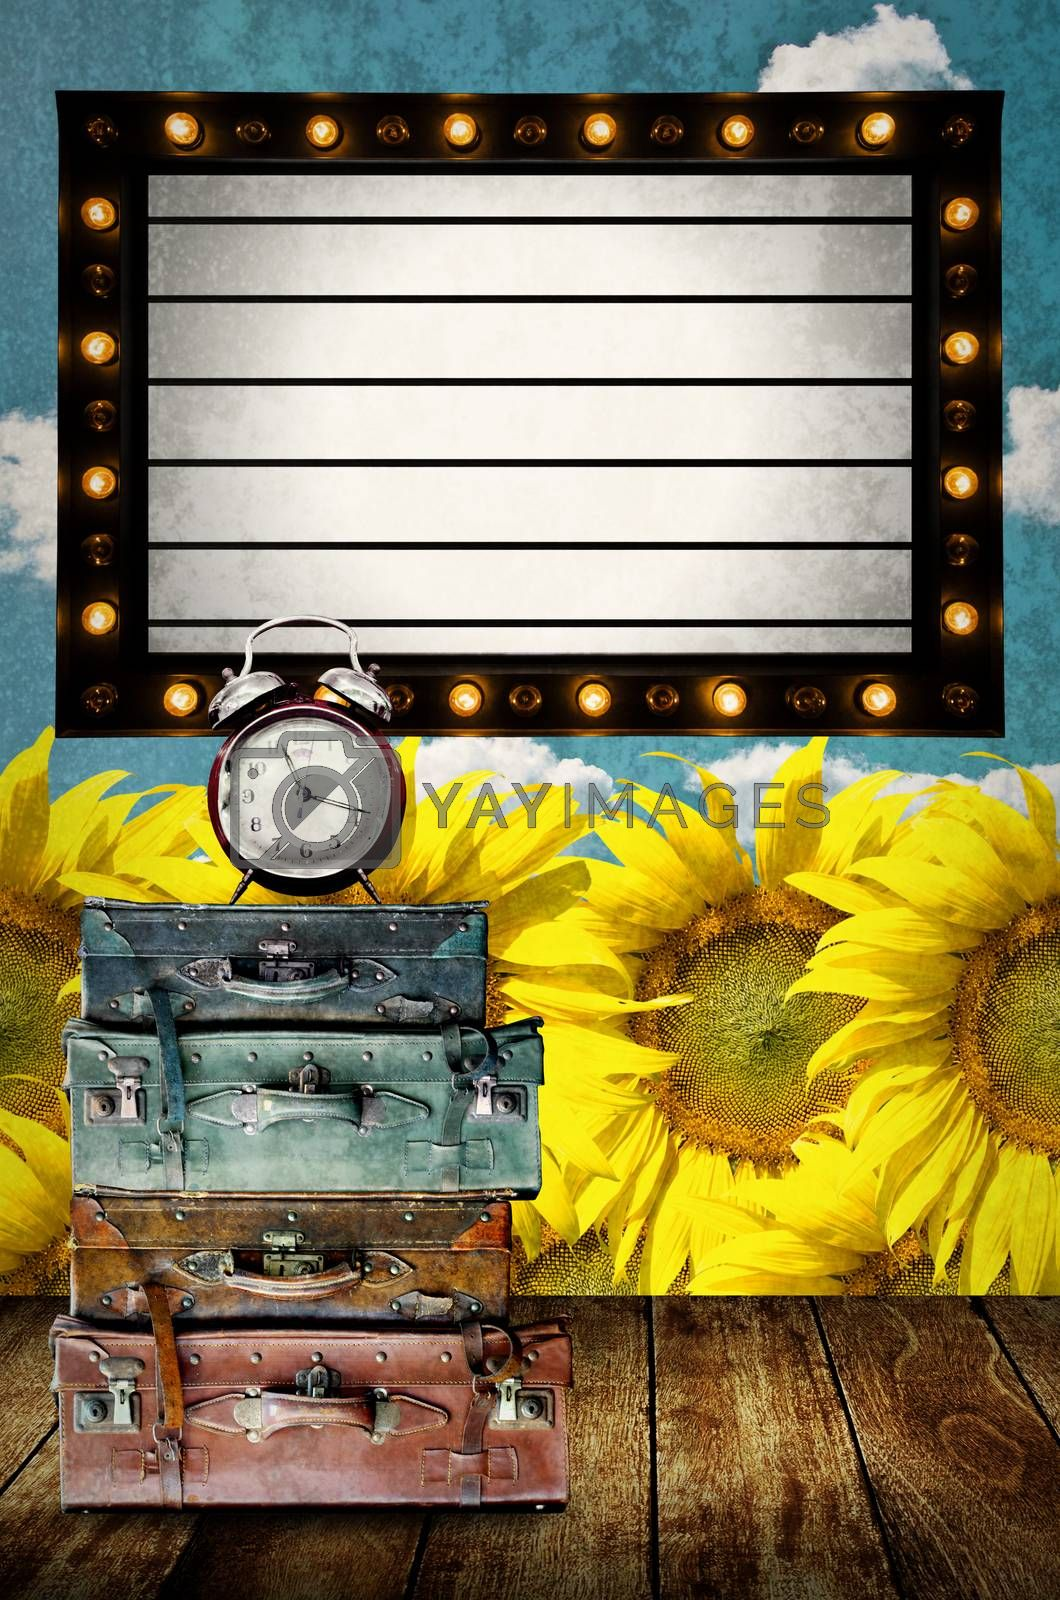 Vintage Light box program board with vintage travel bag and clock at sunflower farm